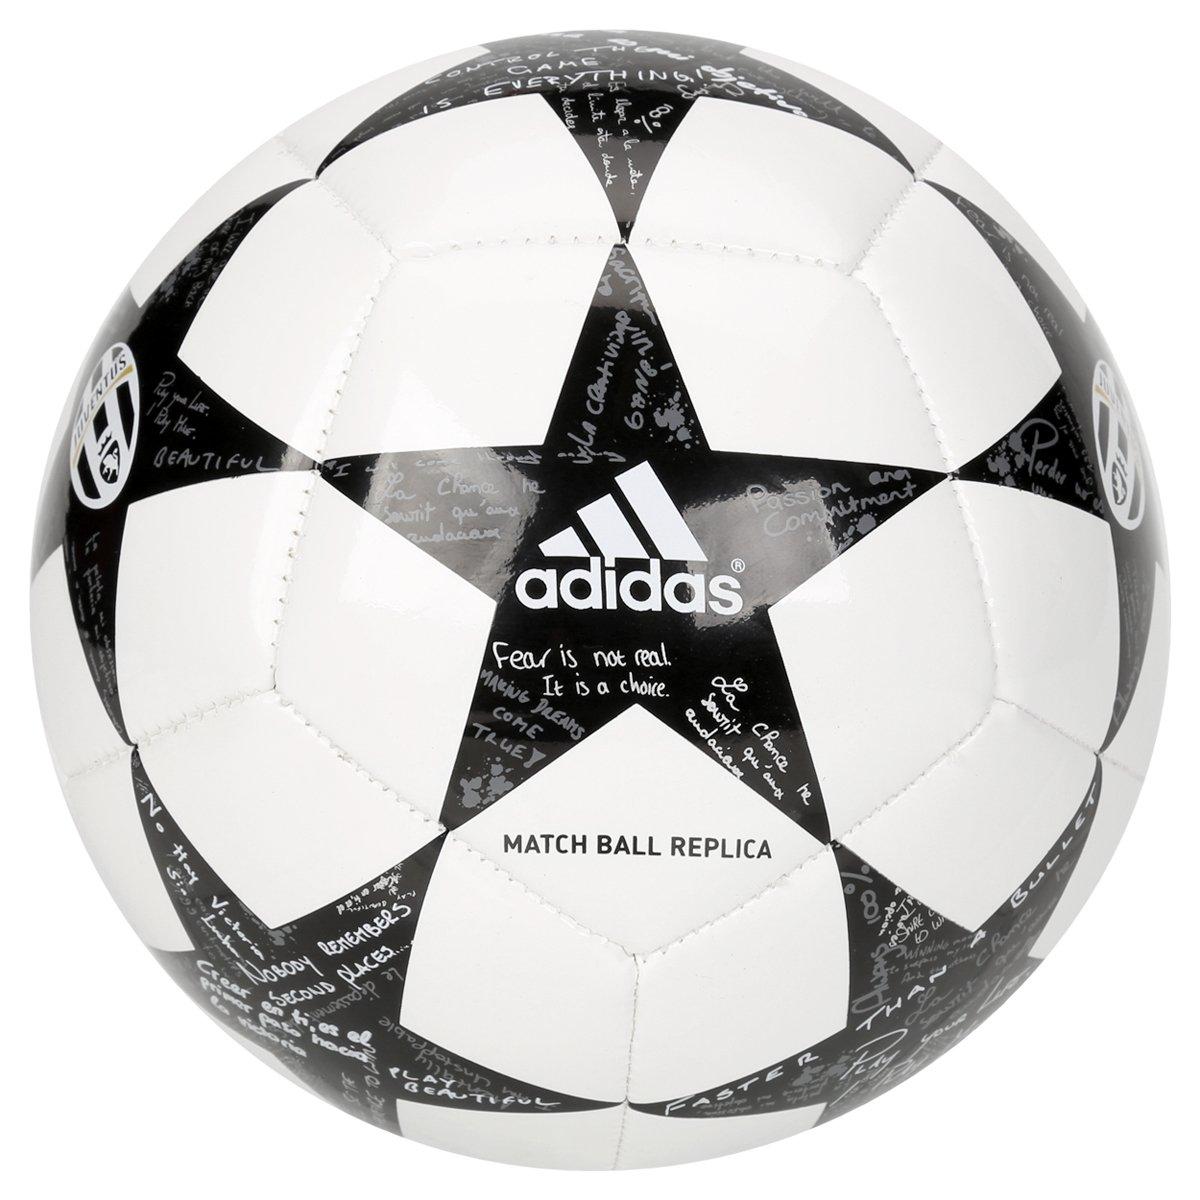 Mini Bola Juventus Adidas UEFA Finale 2016 - Compre Agora  70932b4197c1b